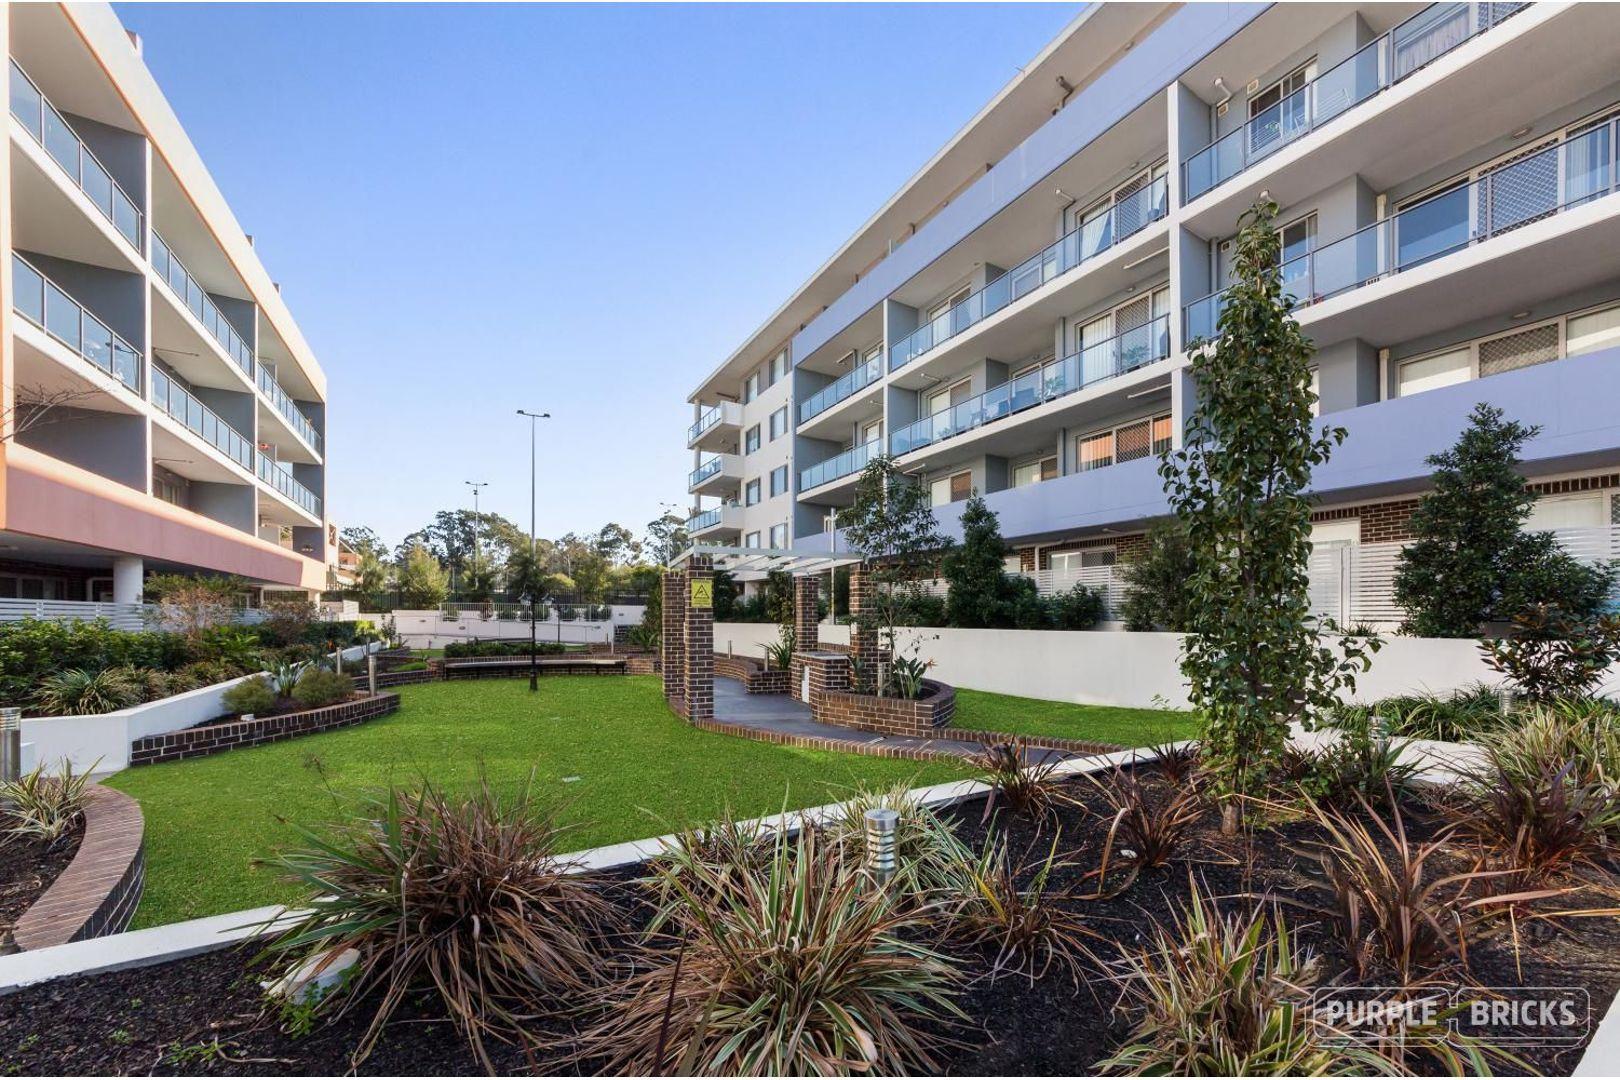 b10 / 8 Myrtle street, Prospect NSW 2148, Image 1